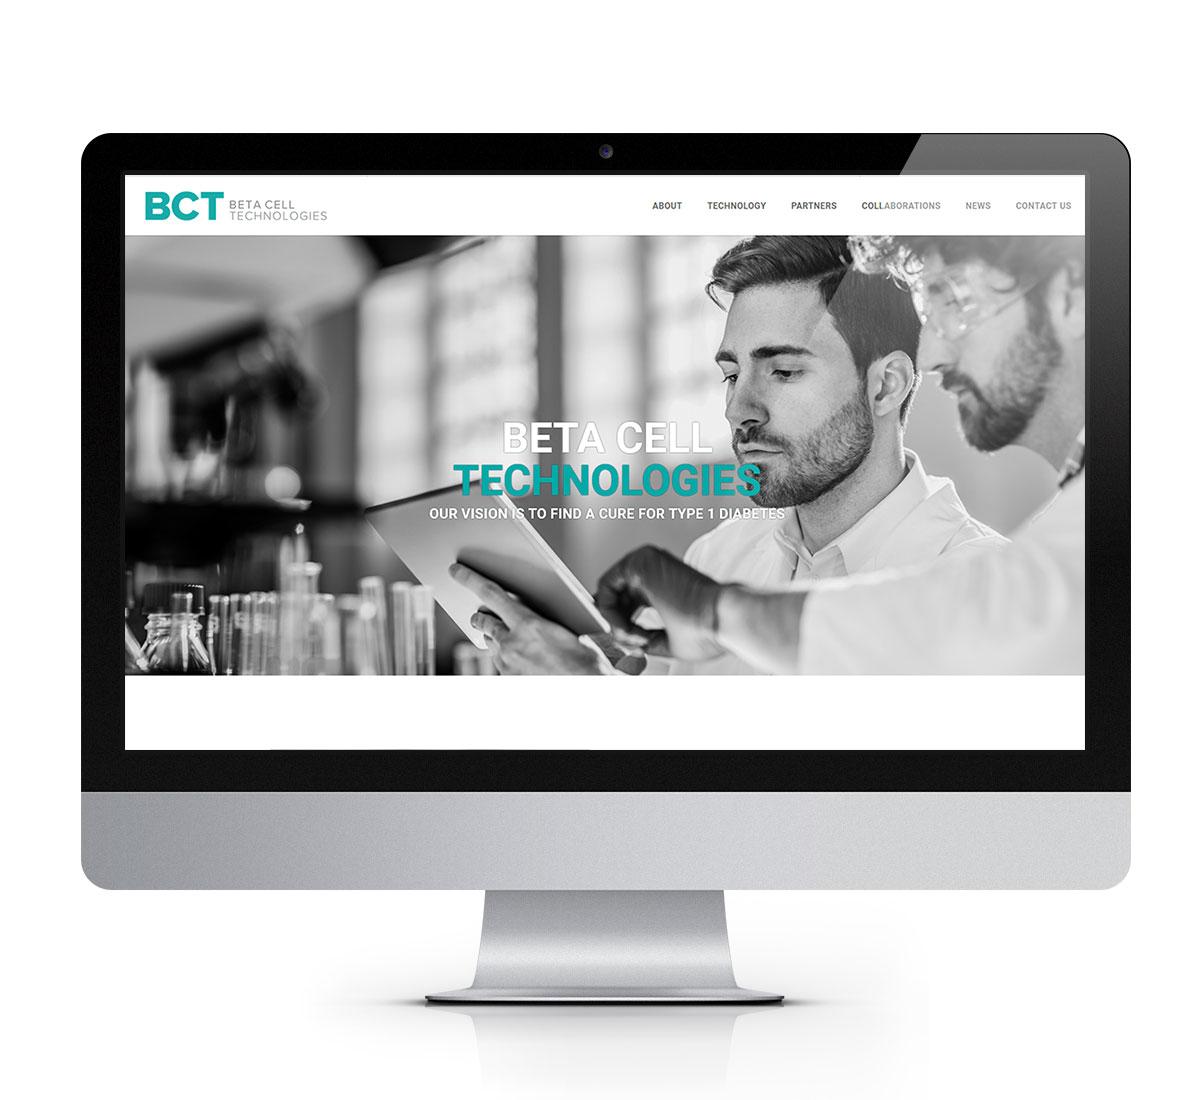 BCT iMac